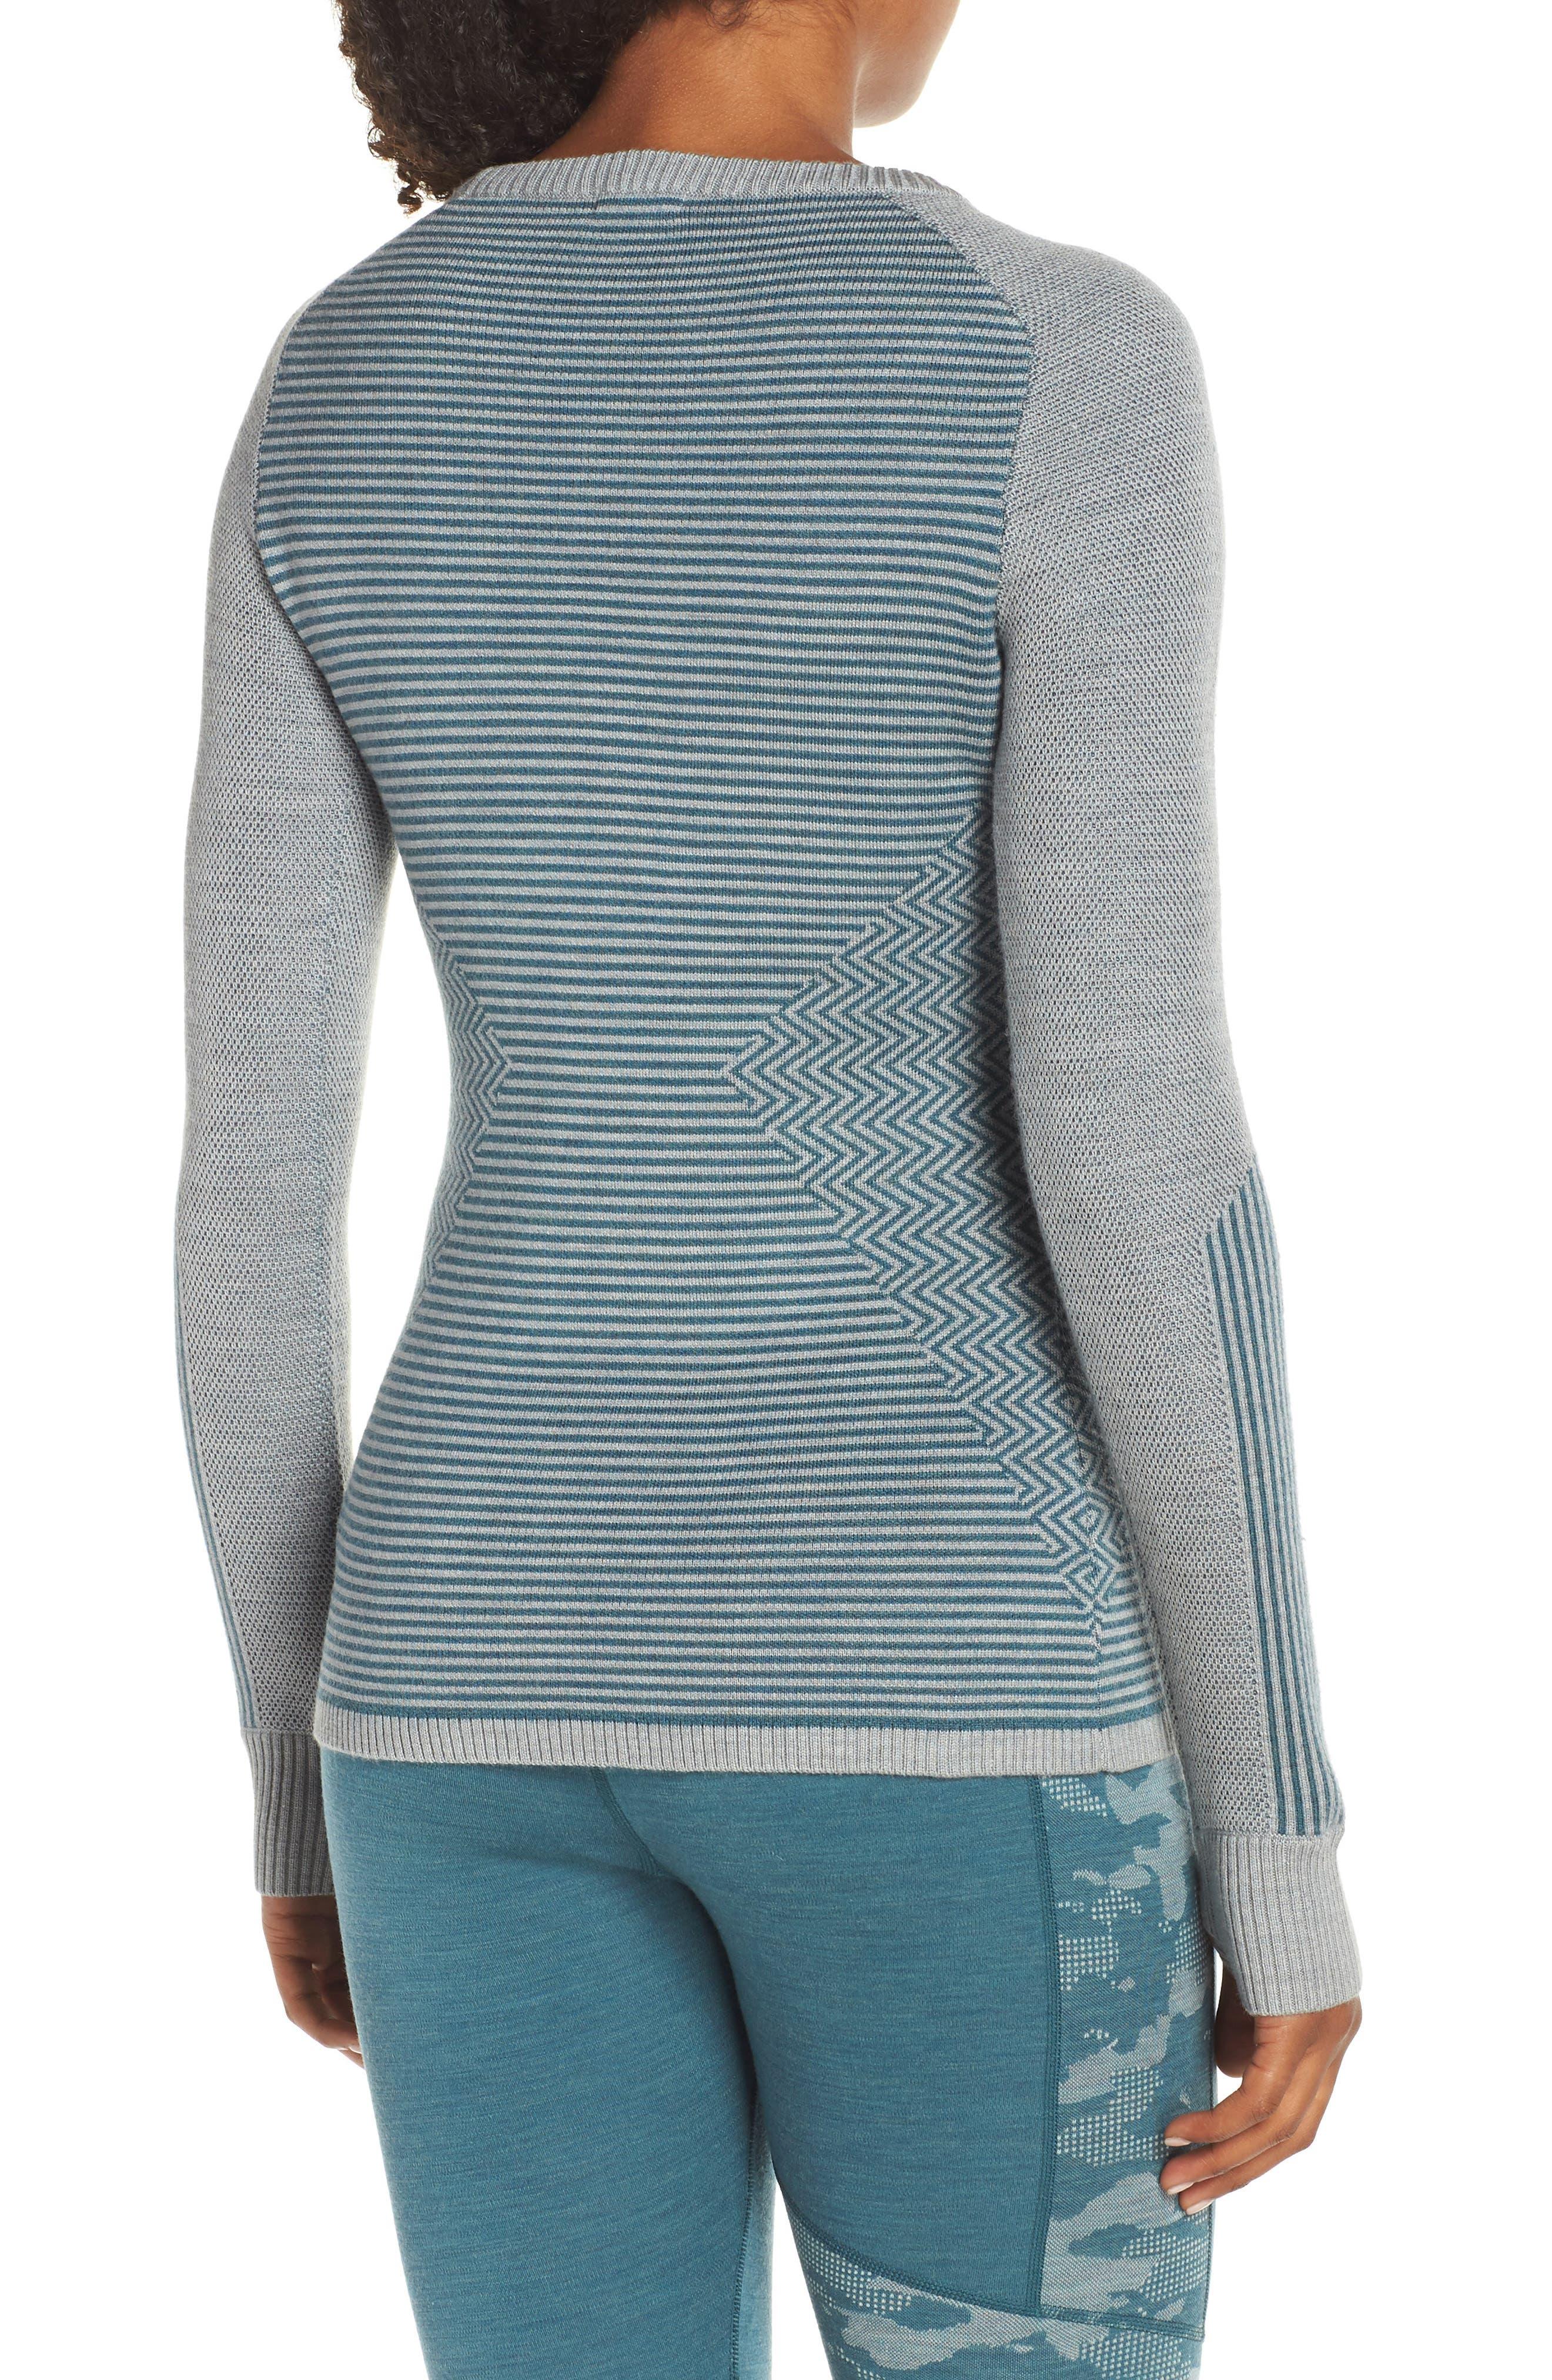 SMARTWOOL,                             Dacono Ski Sweater,                             Alternate thumbnail 2, color,                             310